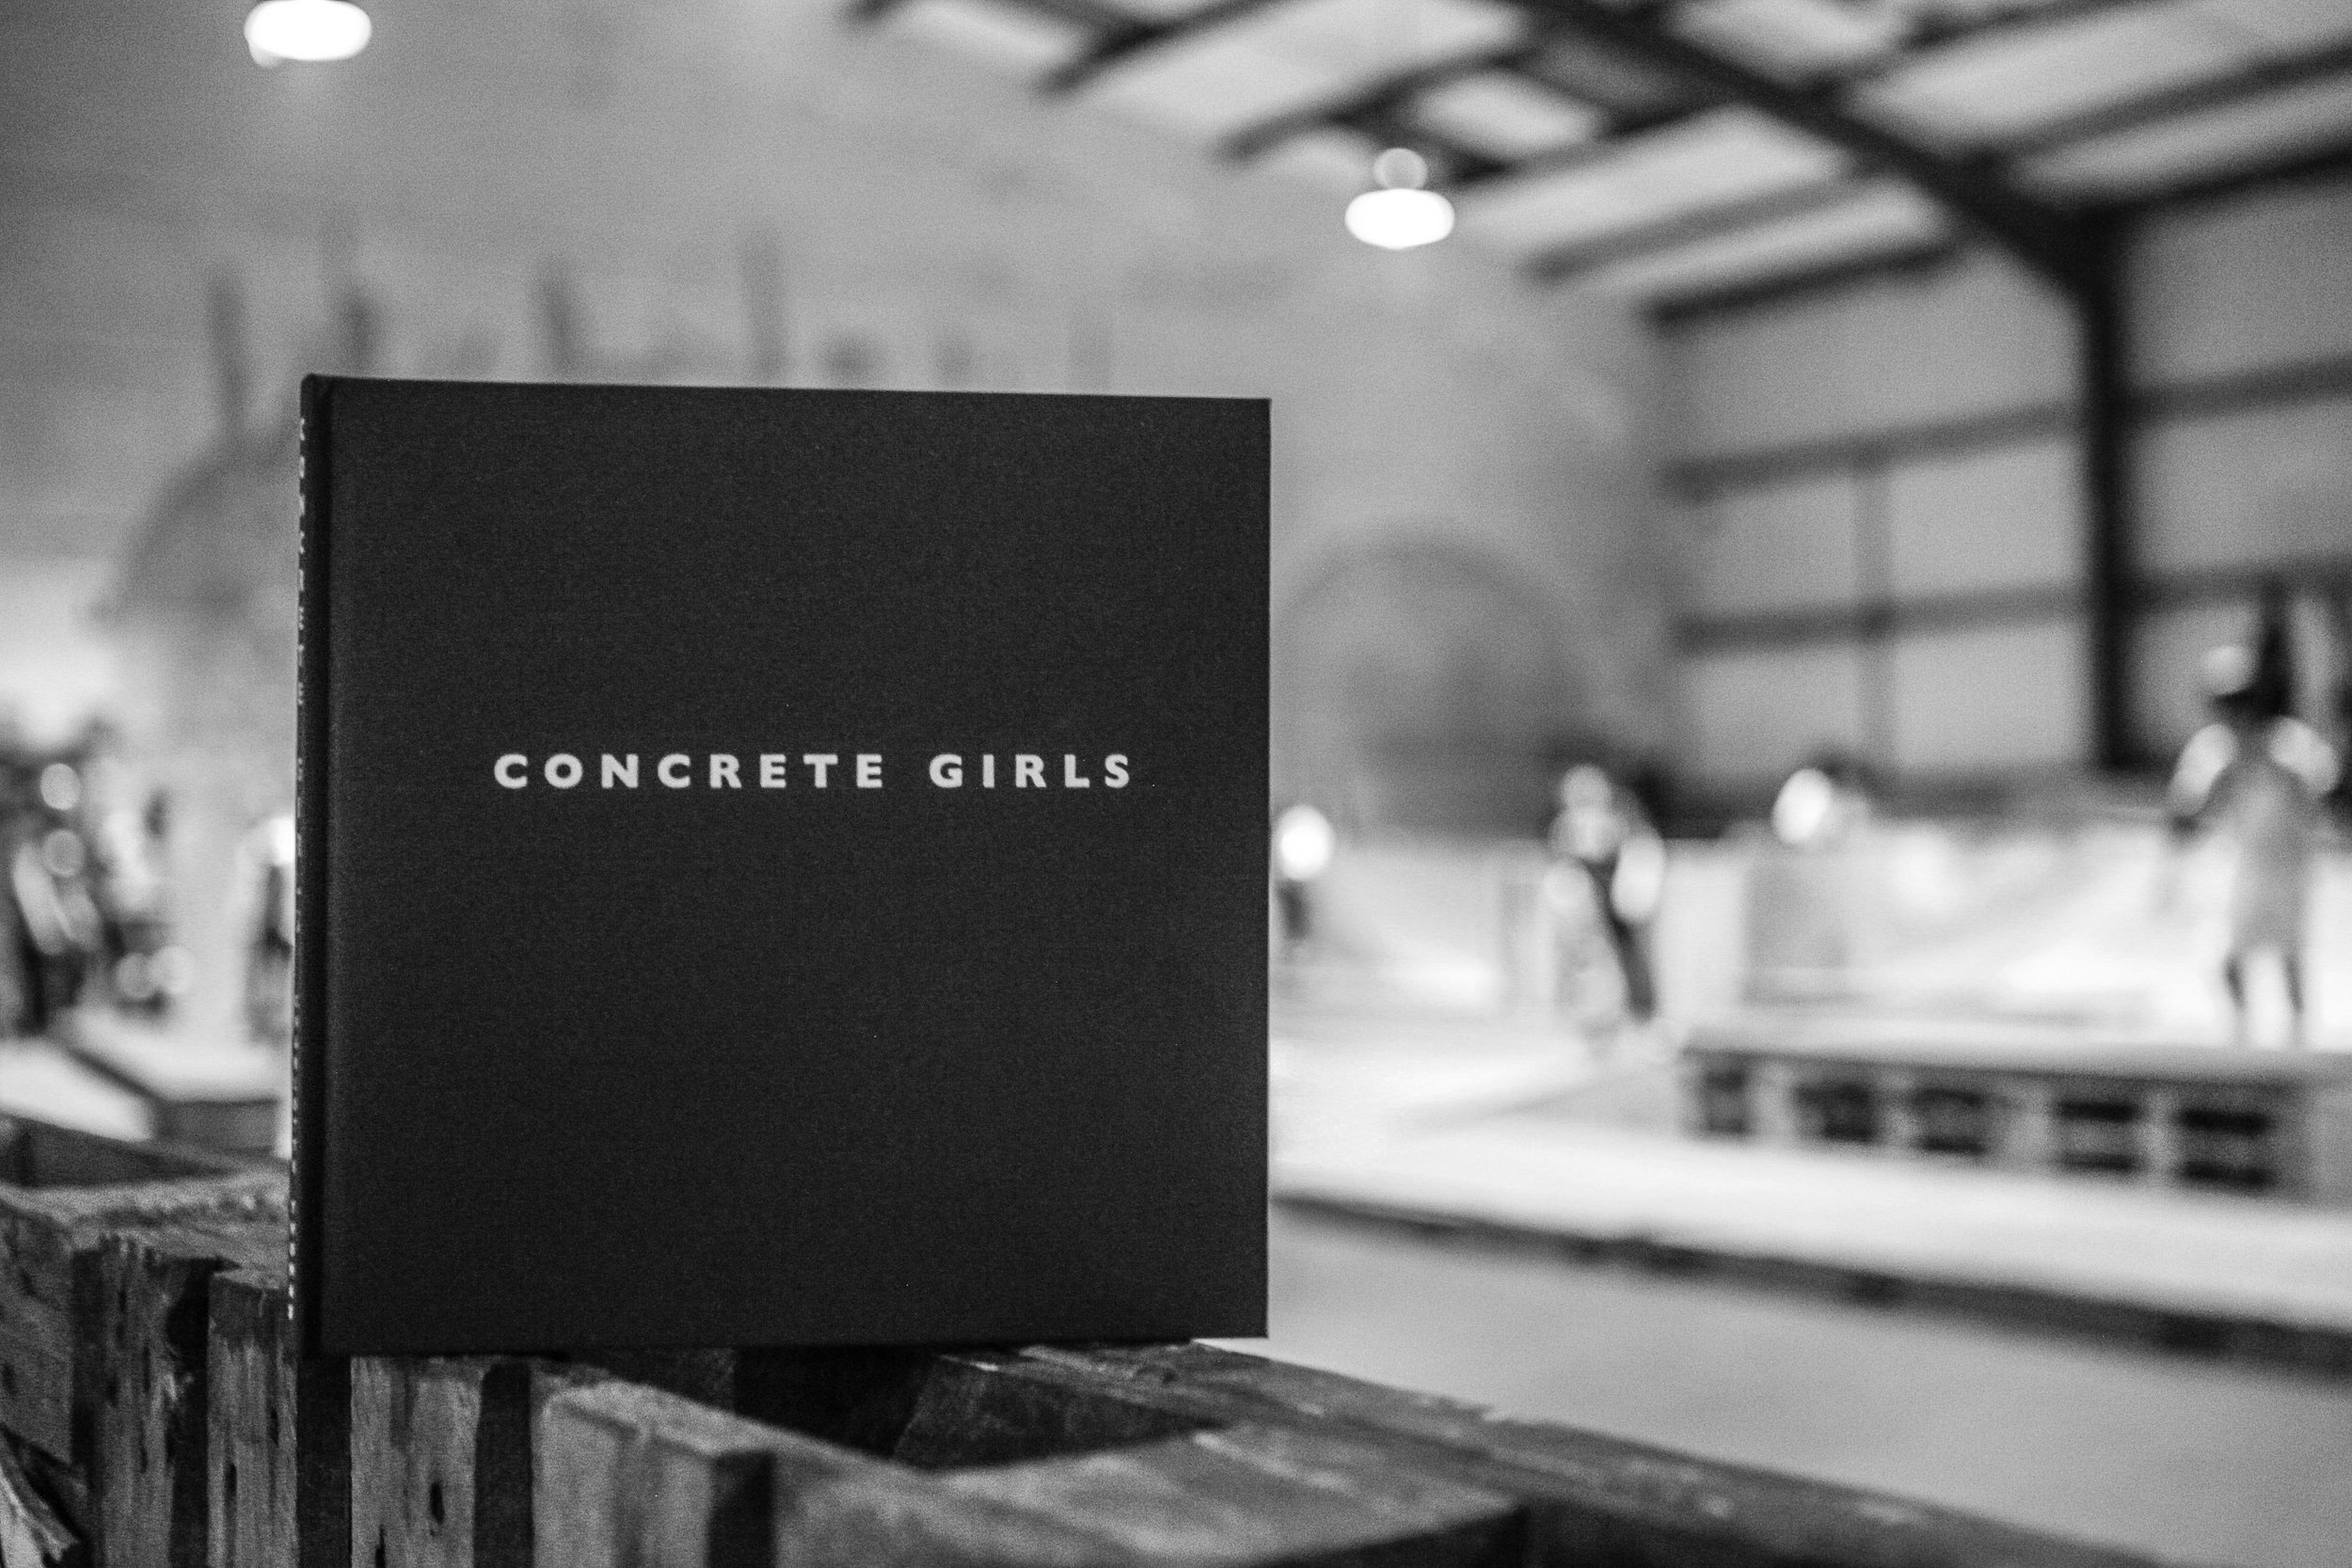 concretegirlsprom-7869.jpg